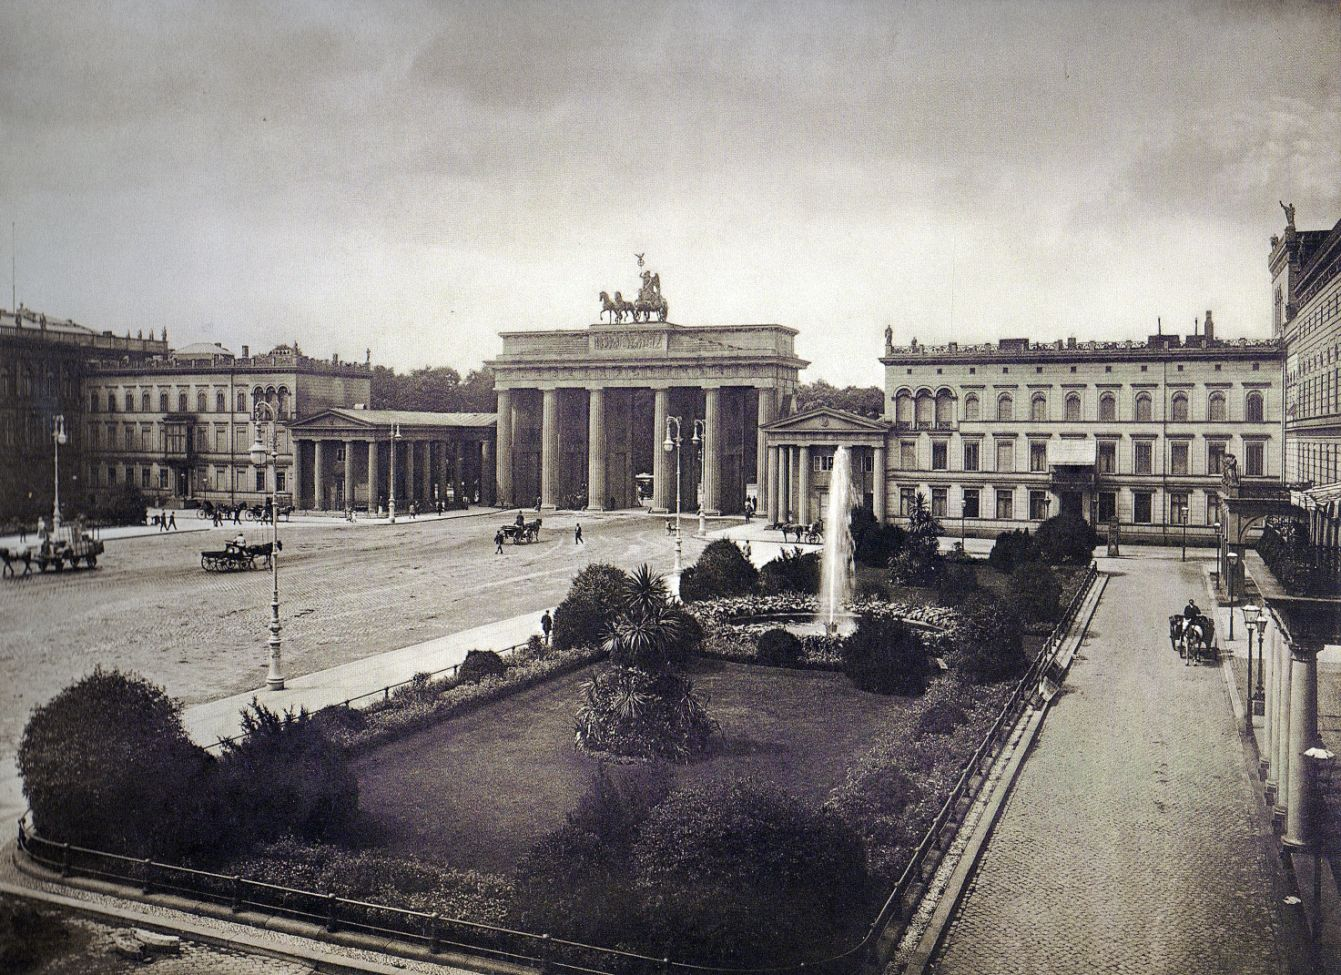 R Prager Berlin Pariser Platz 1894 Brandenburger Tor Berlin Historische Fotos Hauptstadt